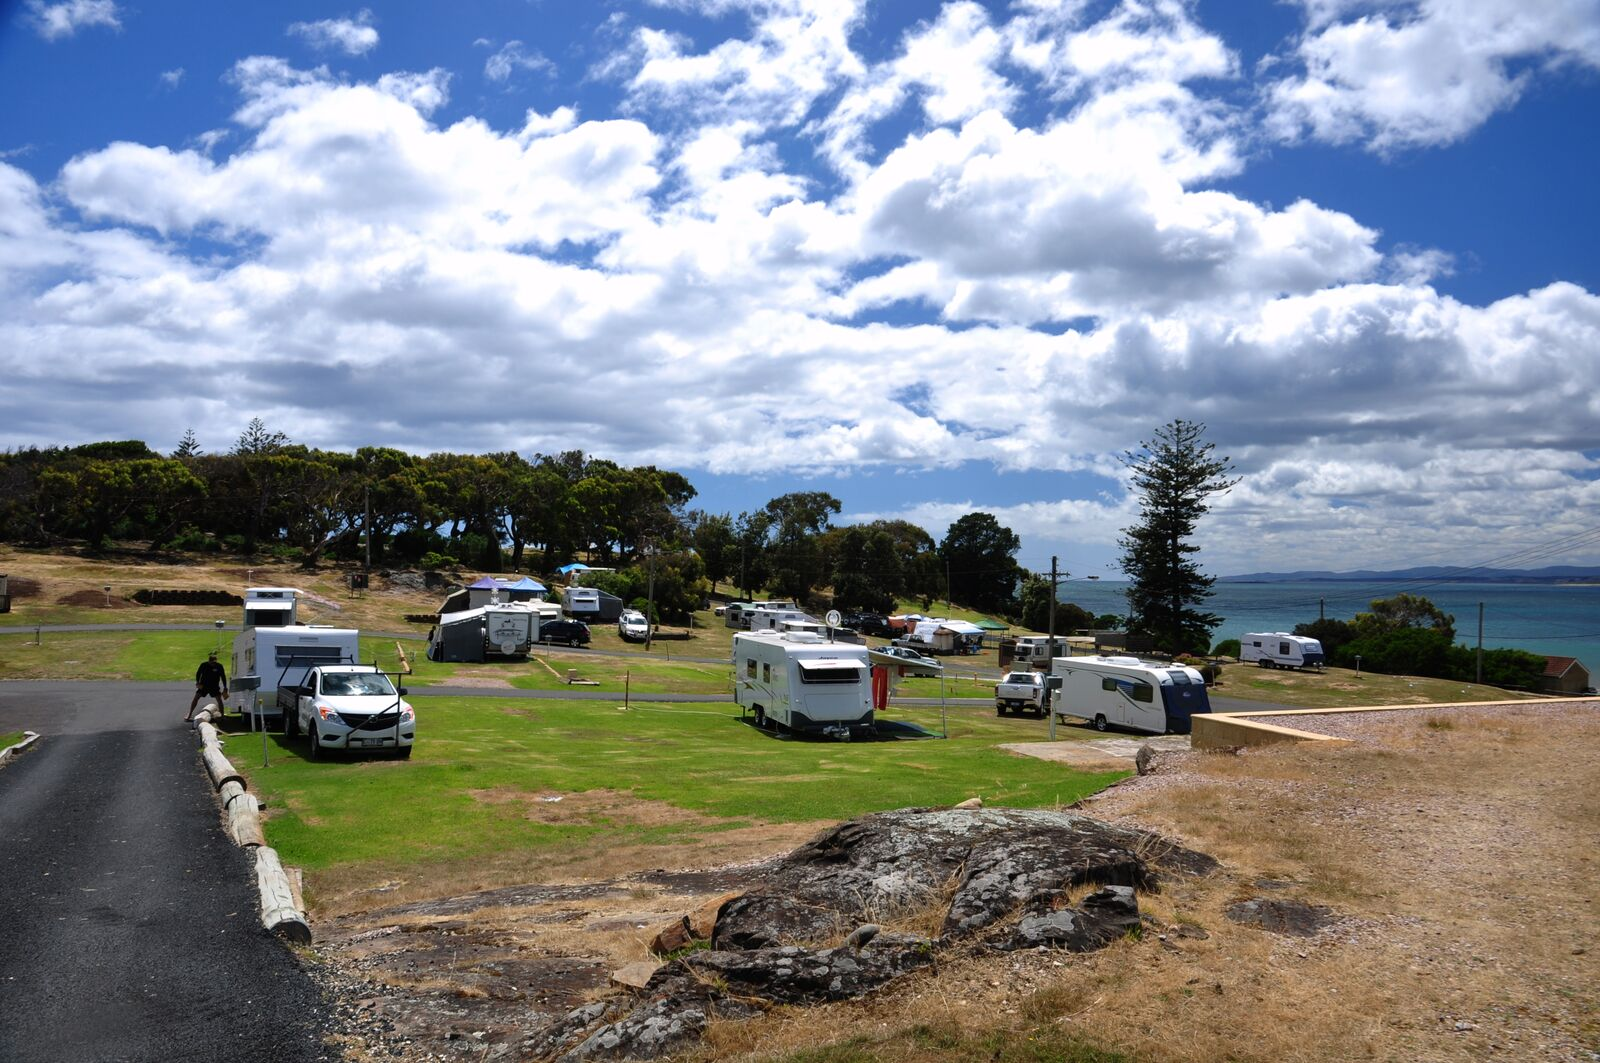 campsites devonport tas mersey bluff caravan park. Black Bedroom Furniture Sets. Home Design Ideas